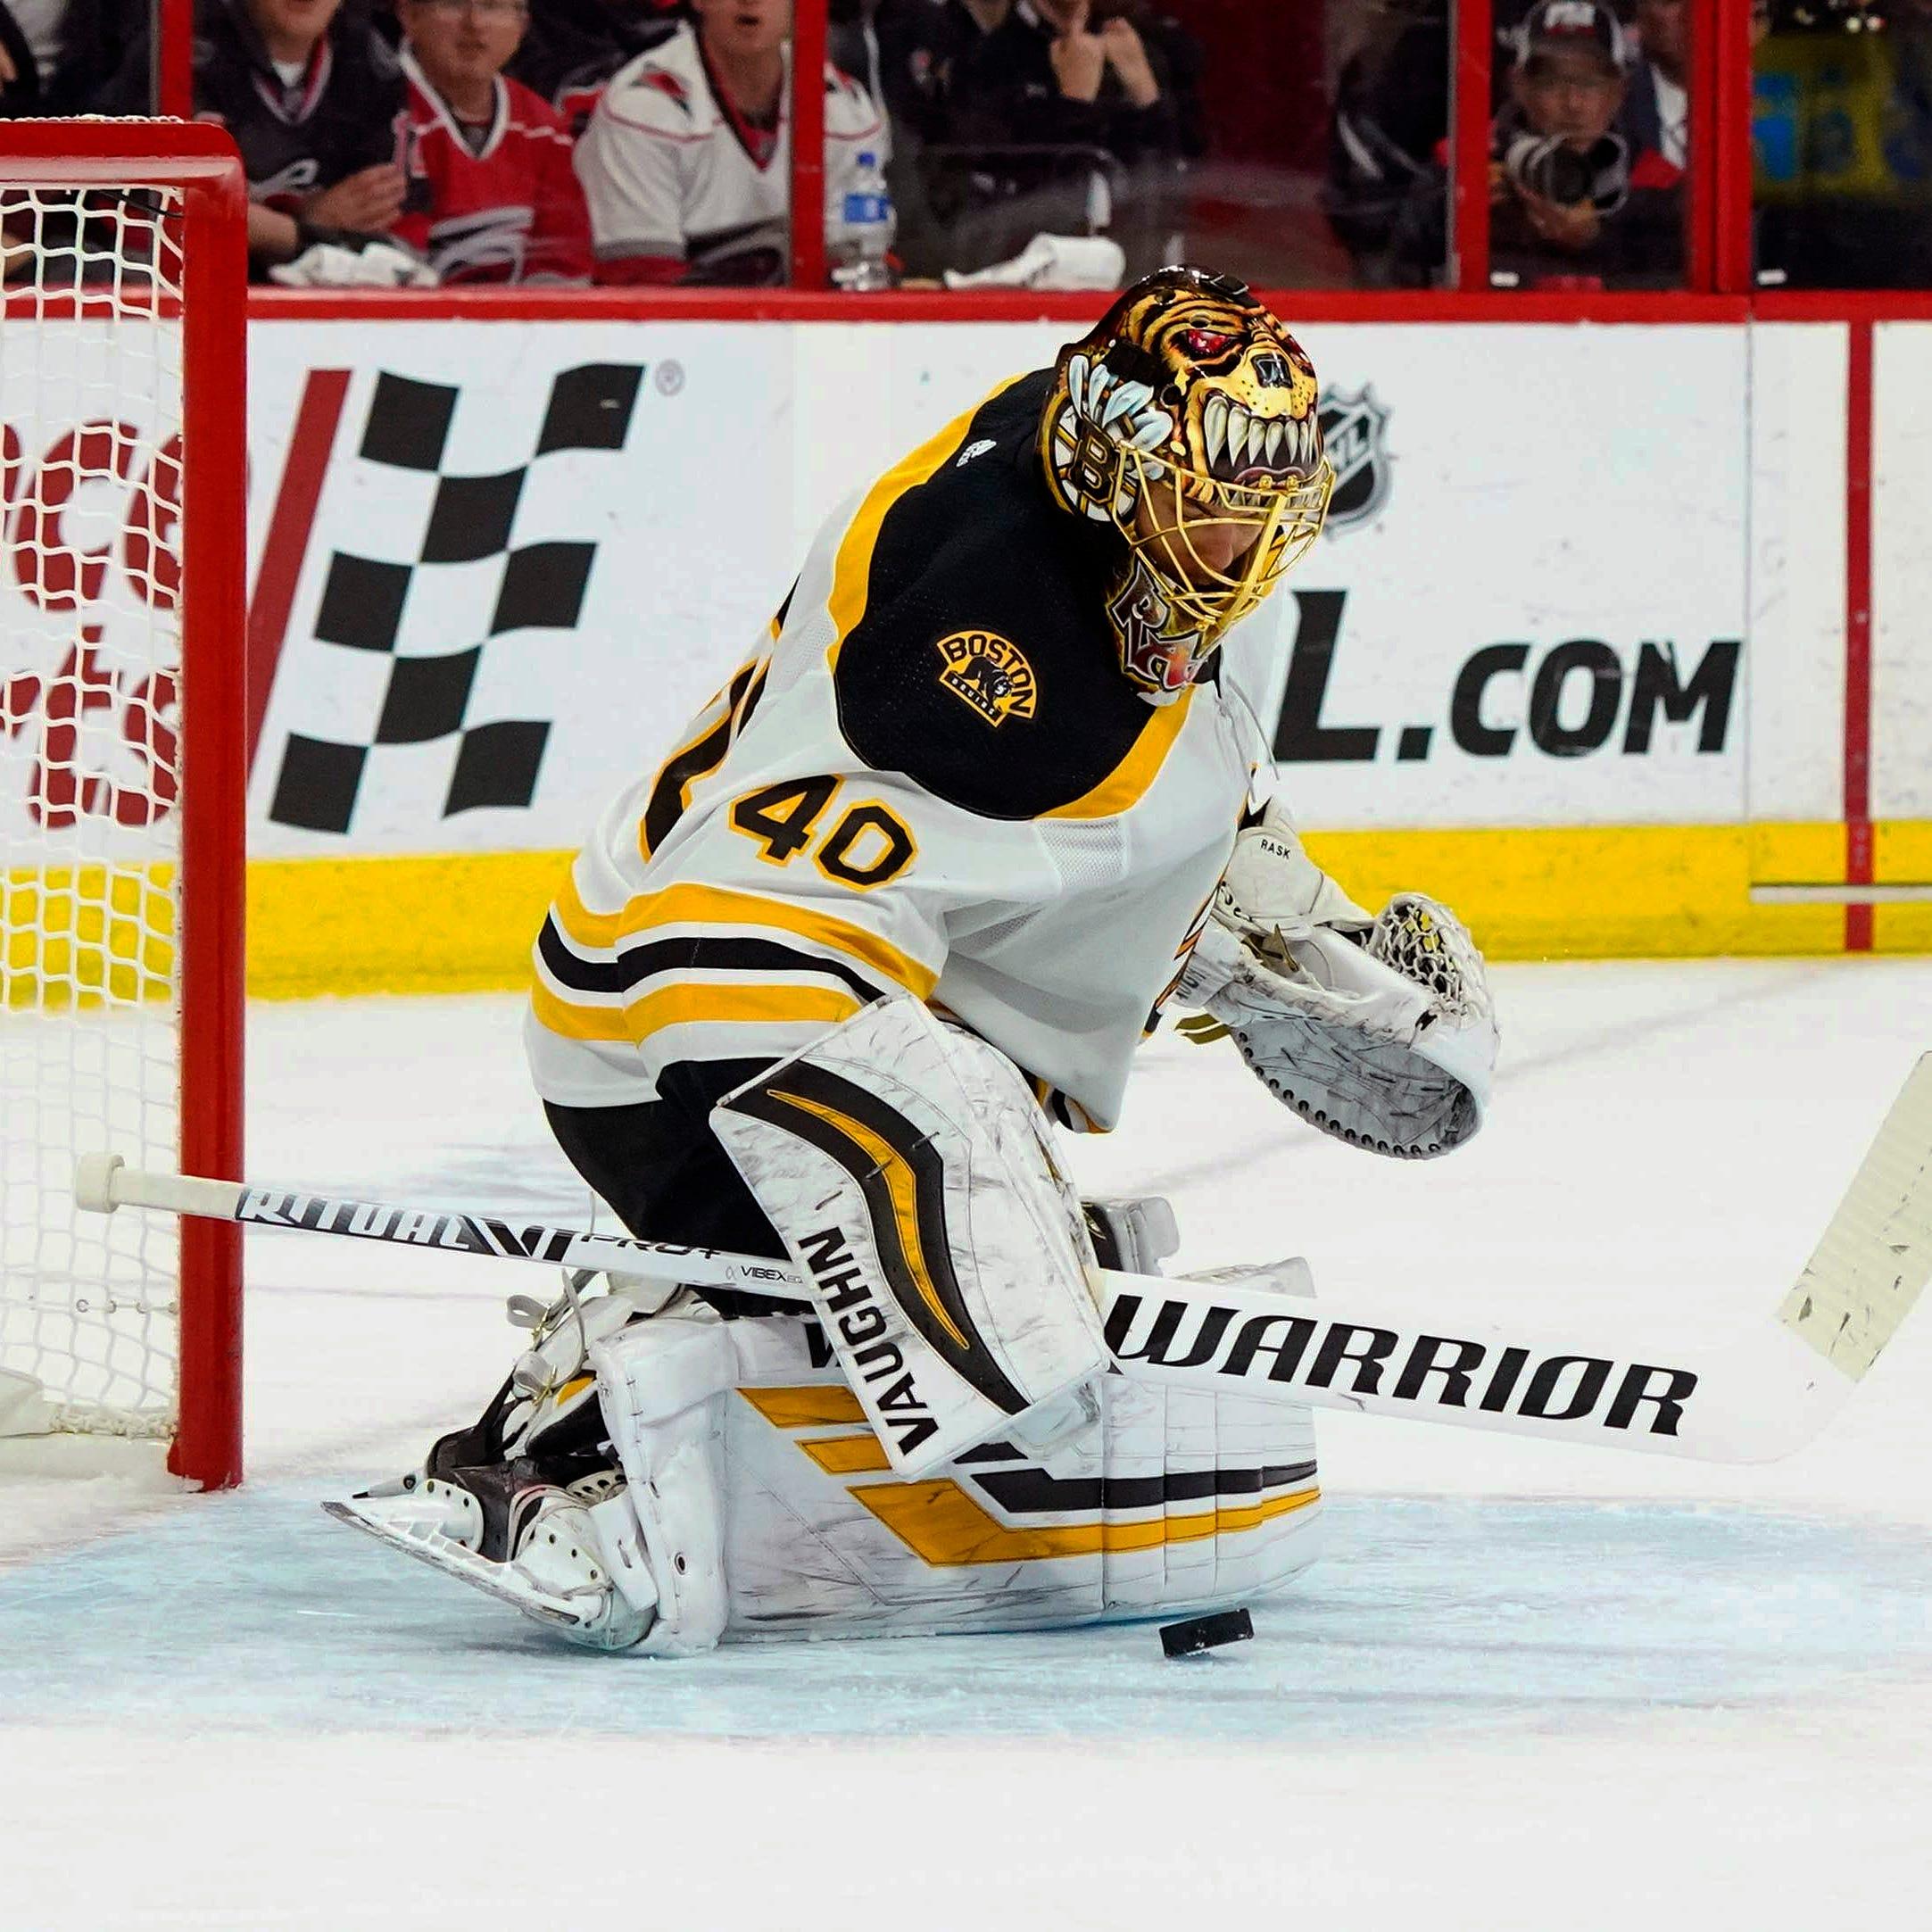 Bruins goalie Tuukka Rask had a strong Eastern Conference final against the Hurricanes.